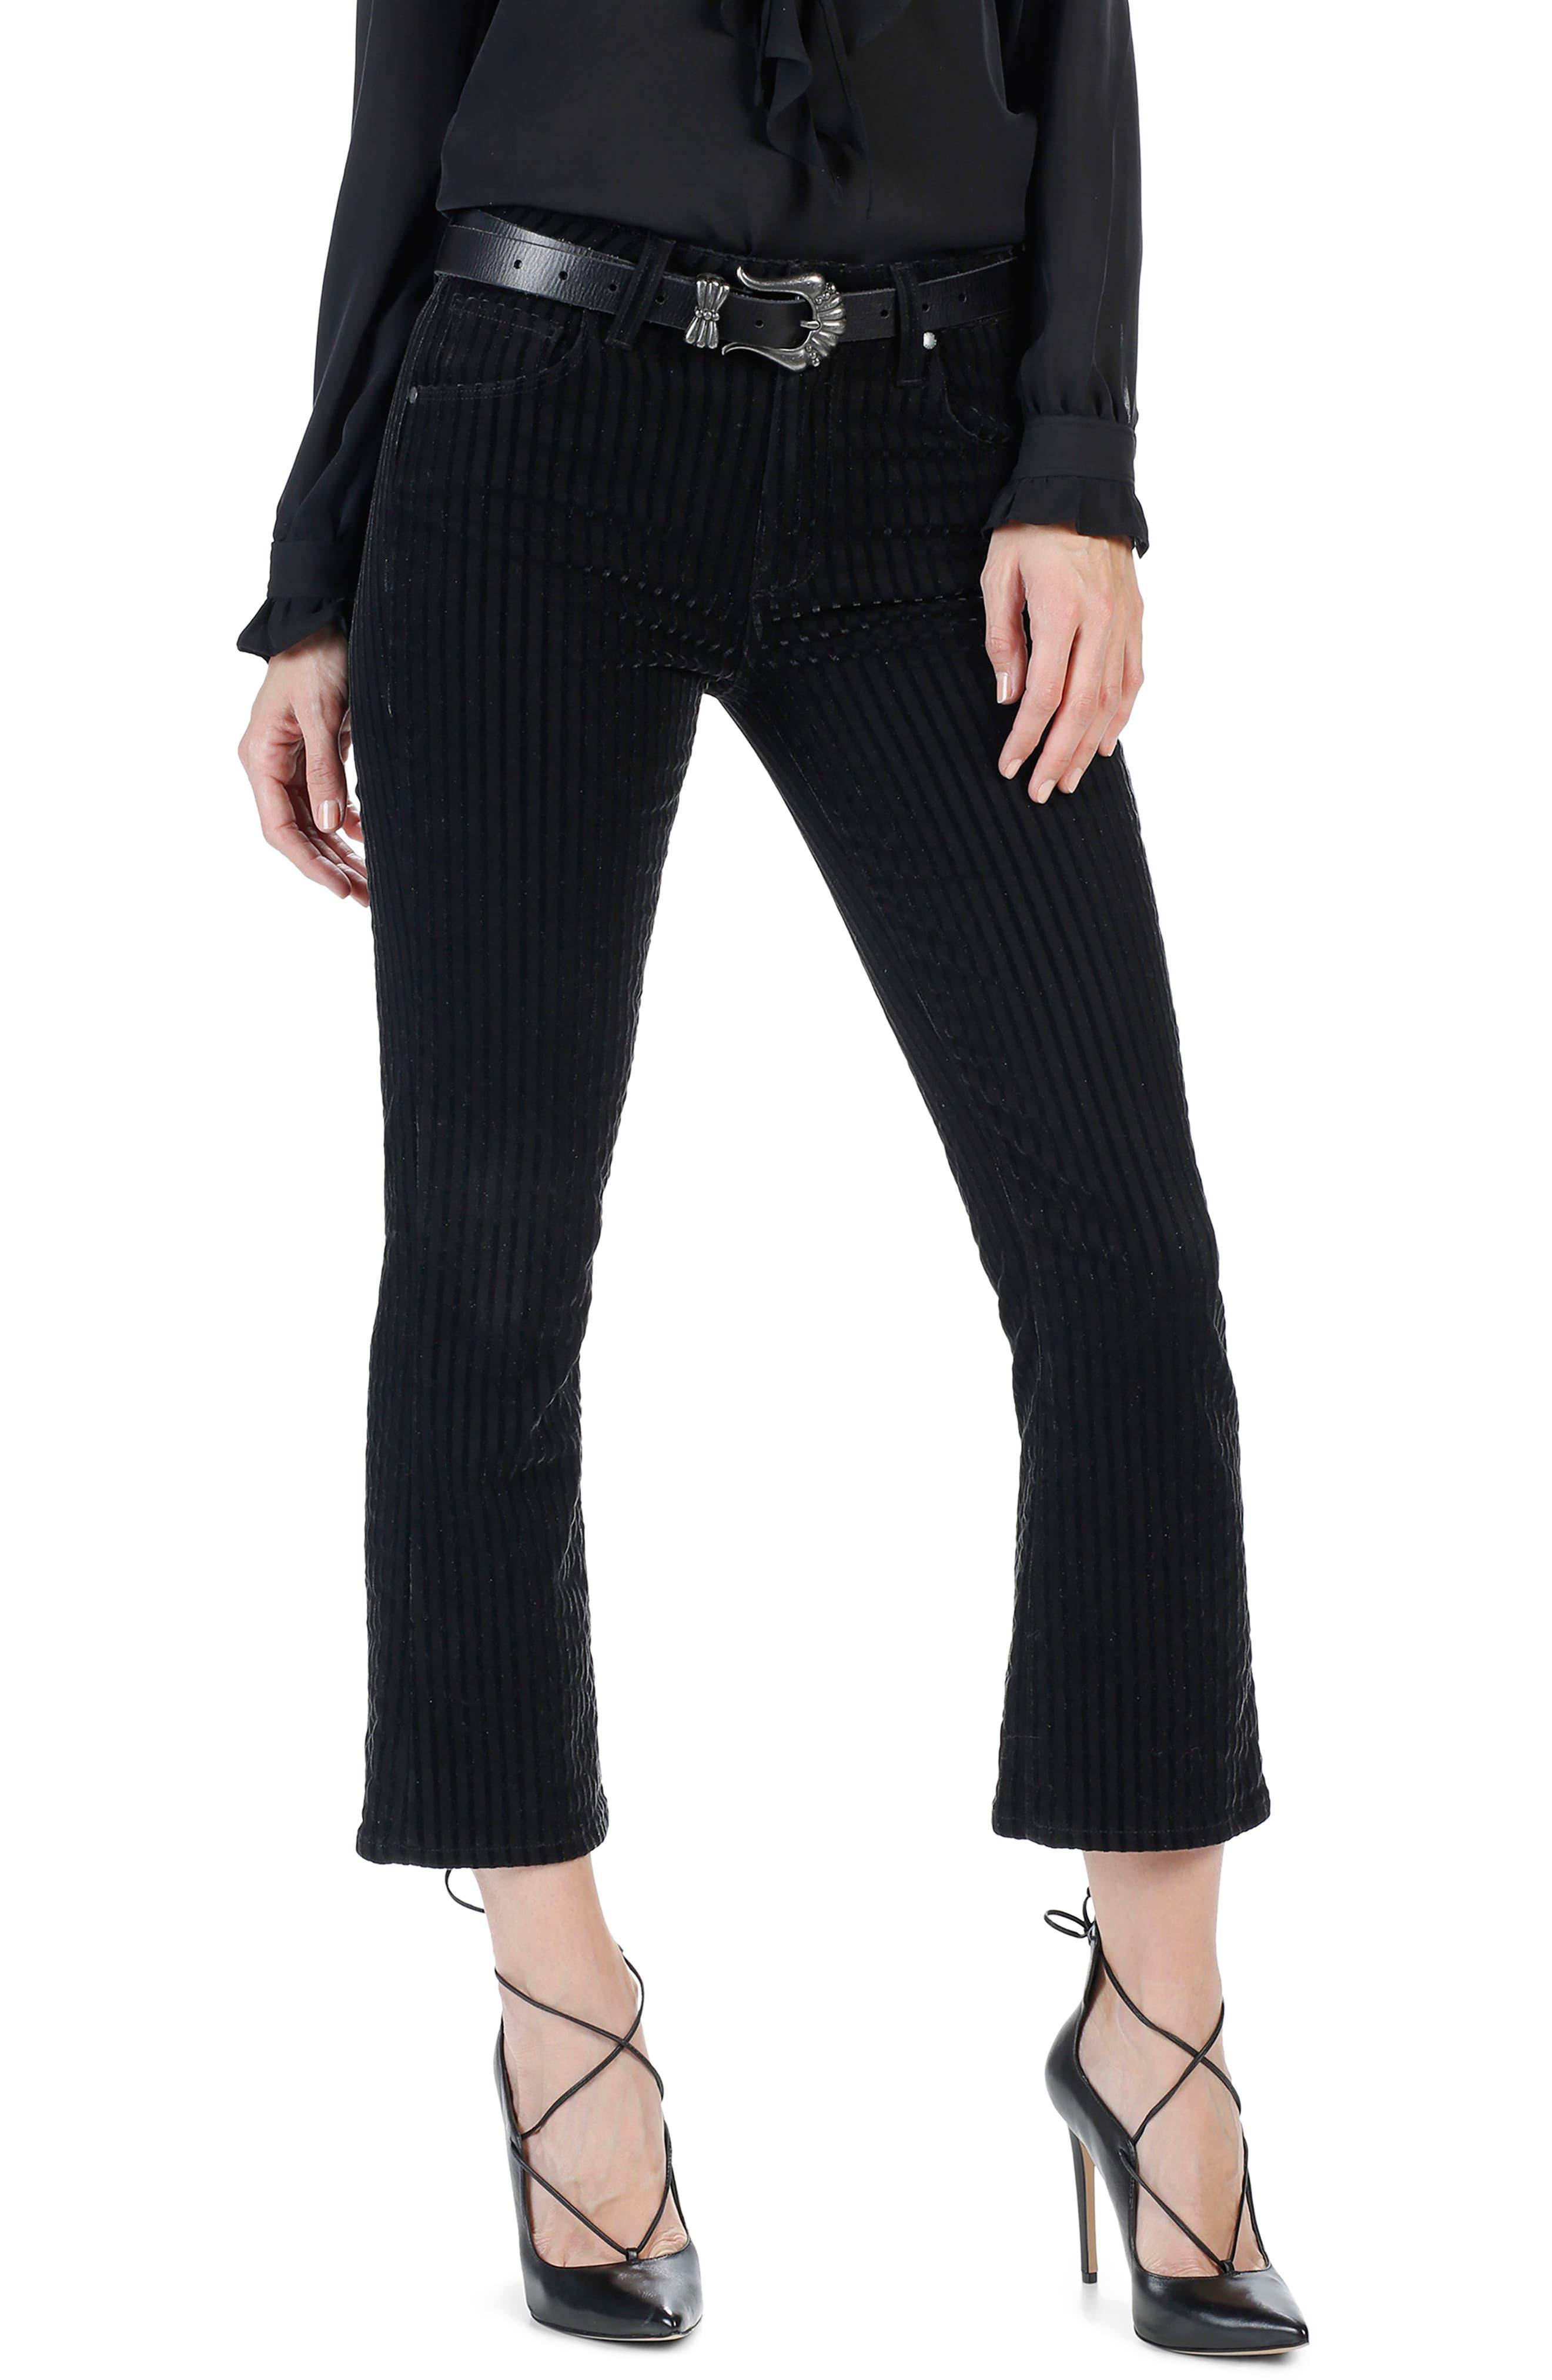 Colette High Waist Crop Flare Velvet Pants,                             Alternate thumbnail 2, color,                             001